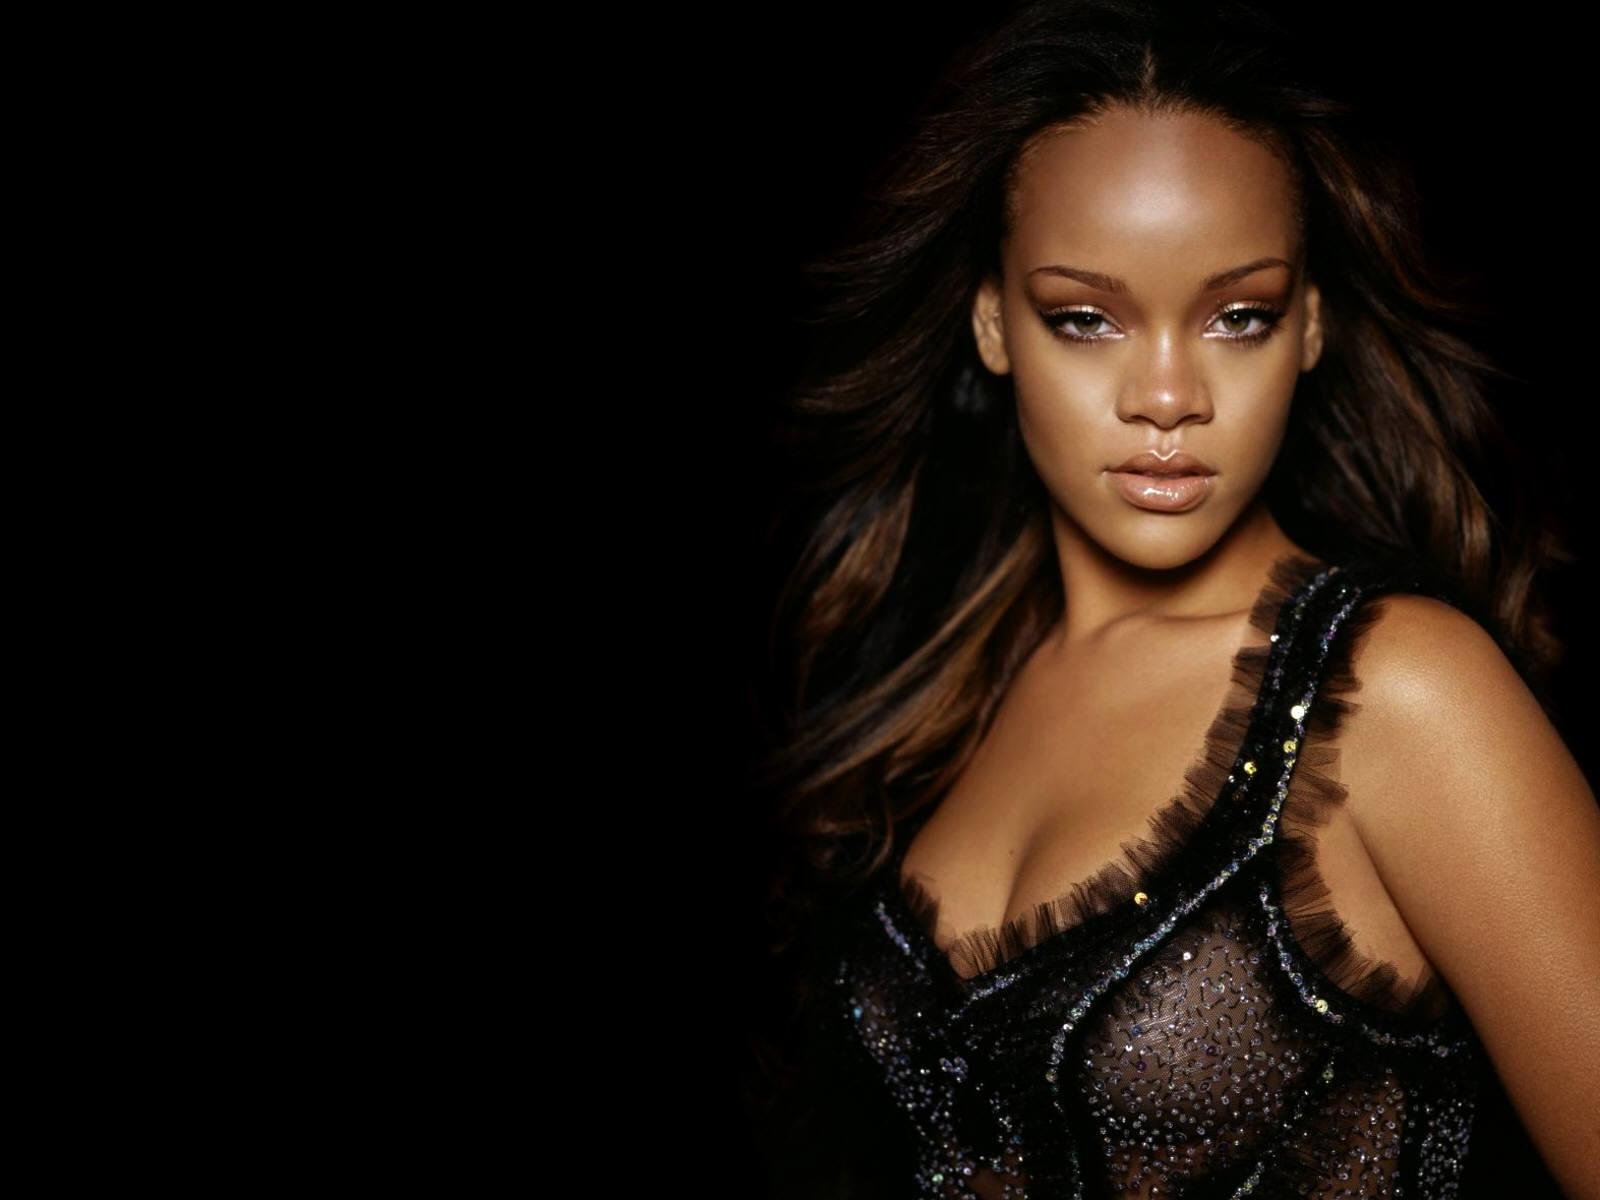 Rihanna Bikini Wallpapers Picture 5